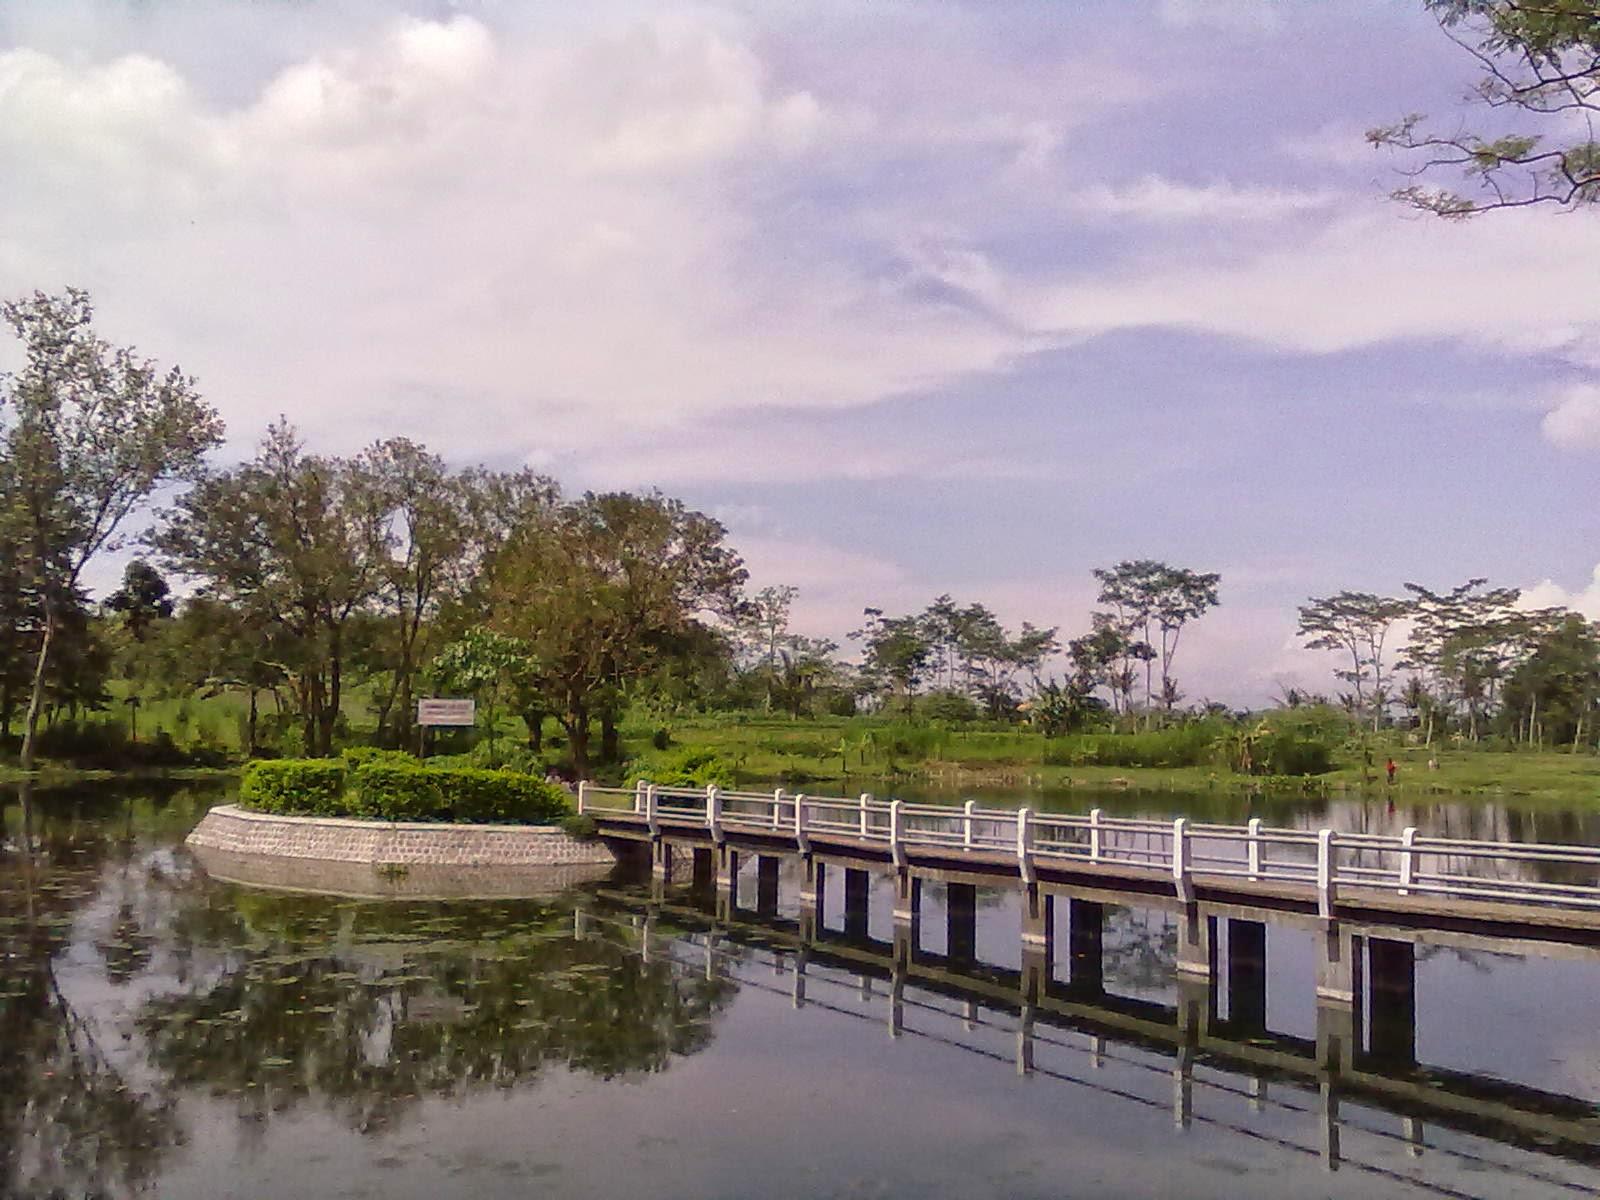 Wisata Air Kediri Sumber Ubalan Kab